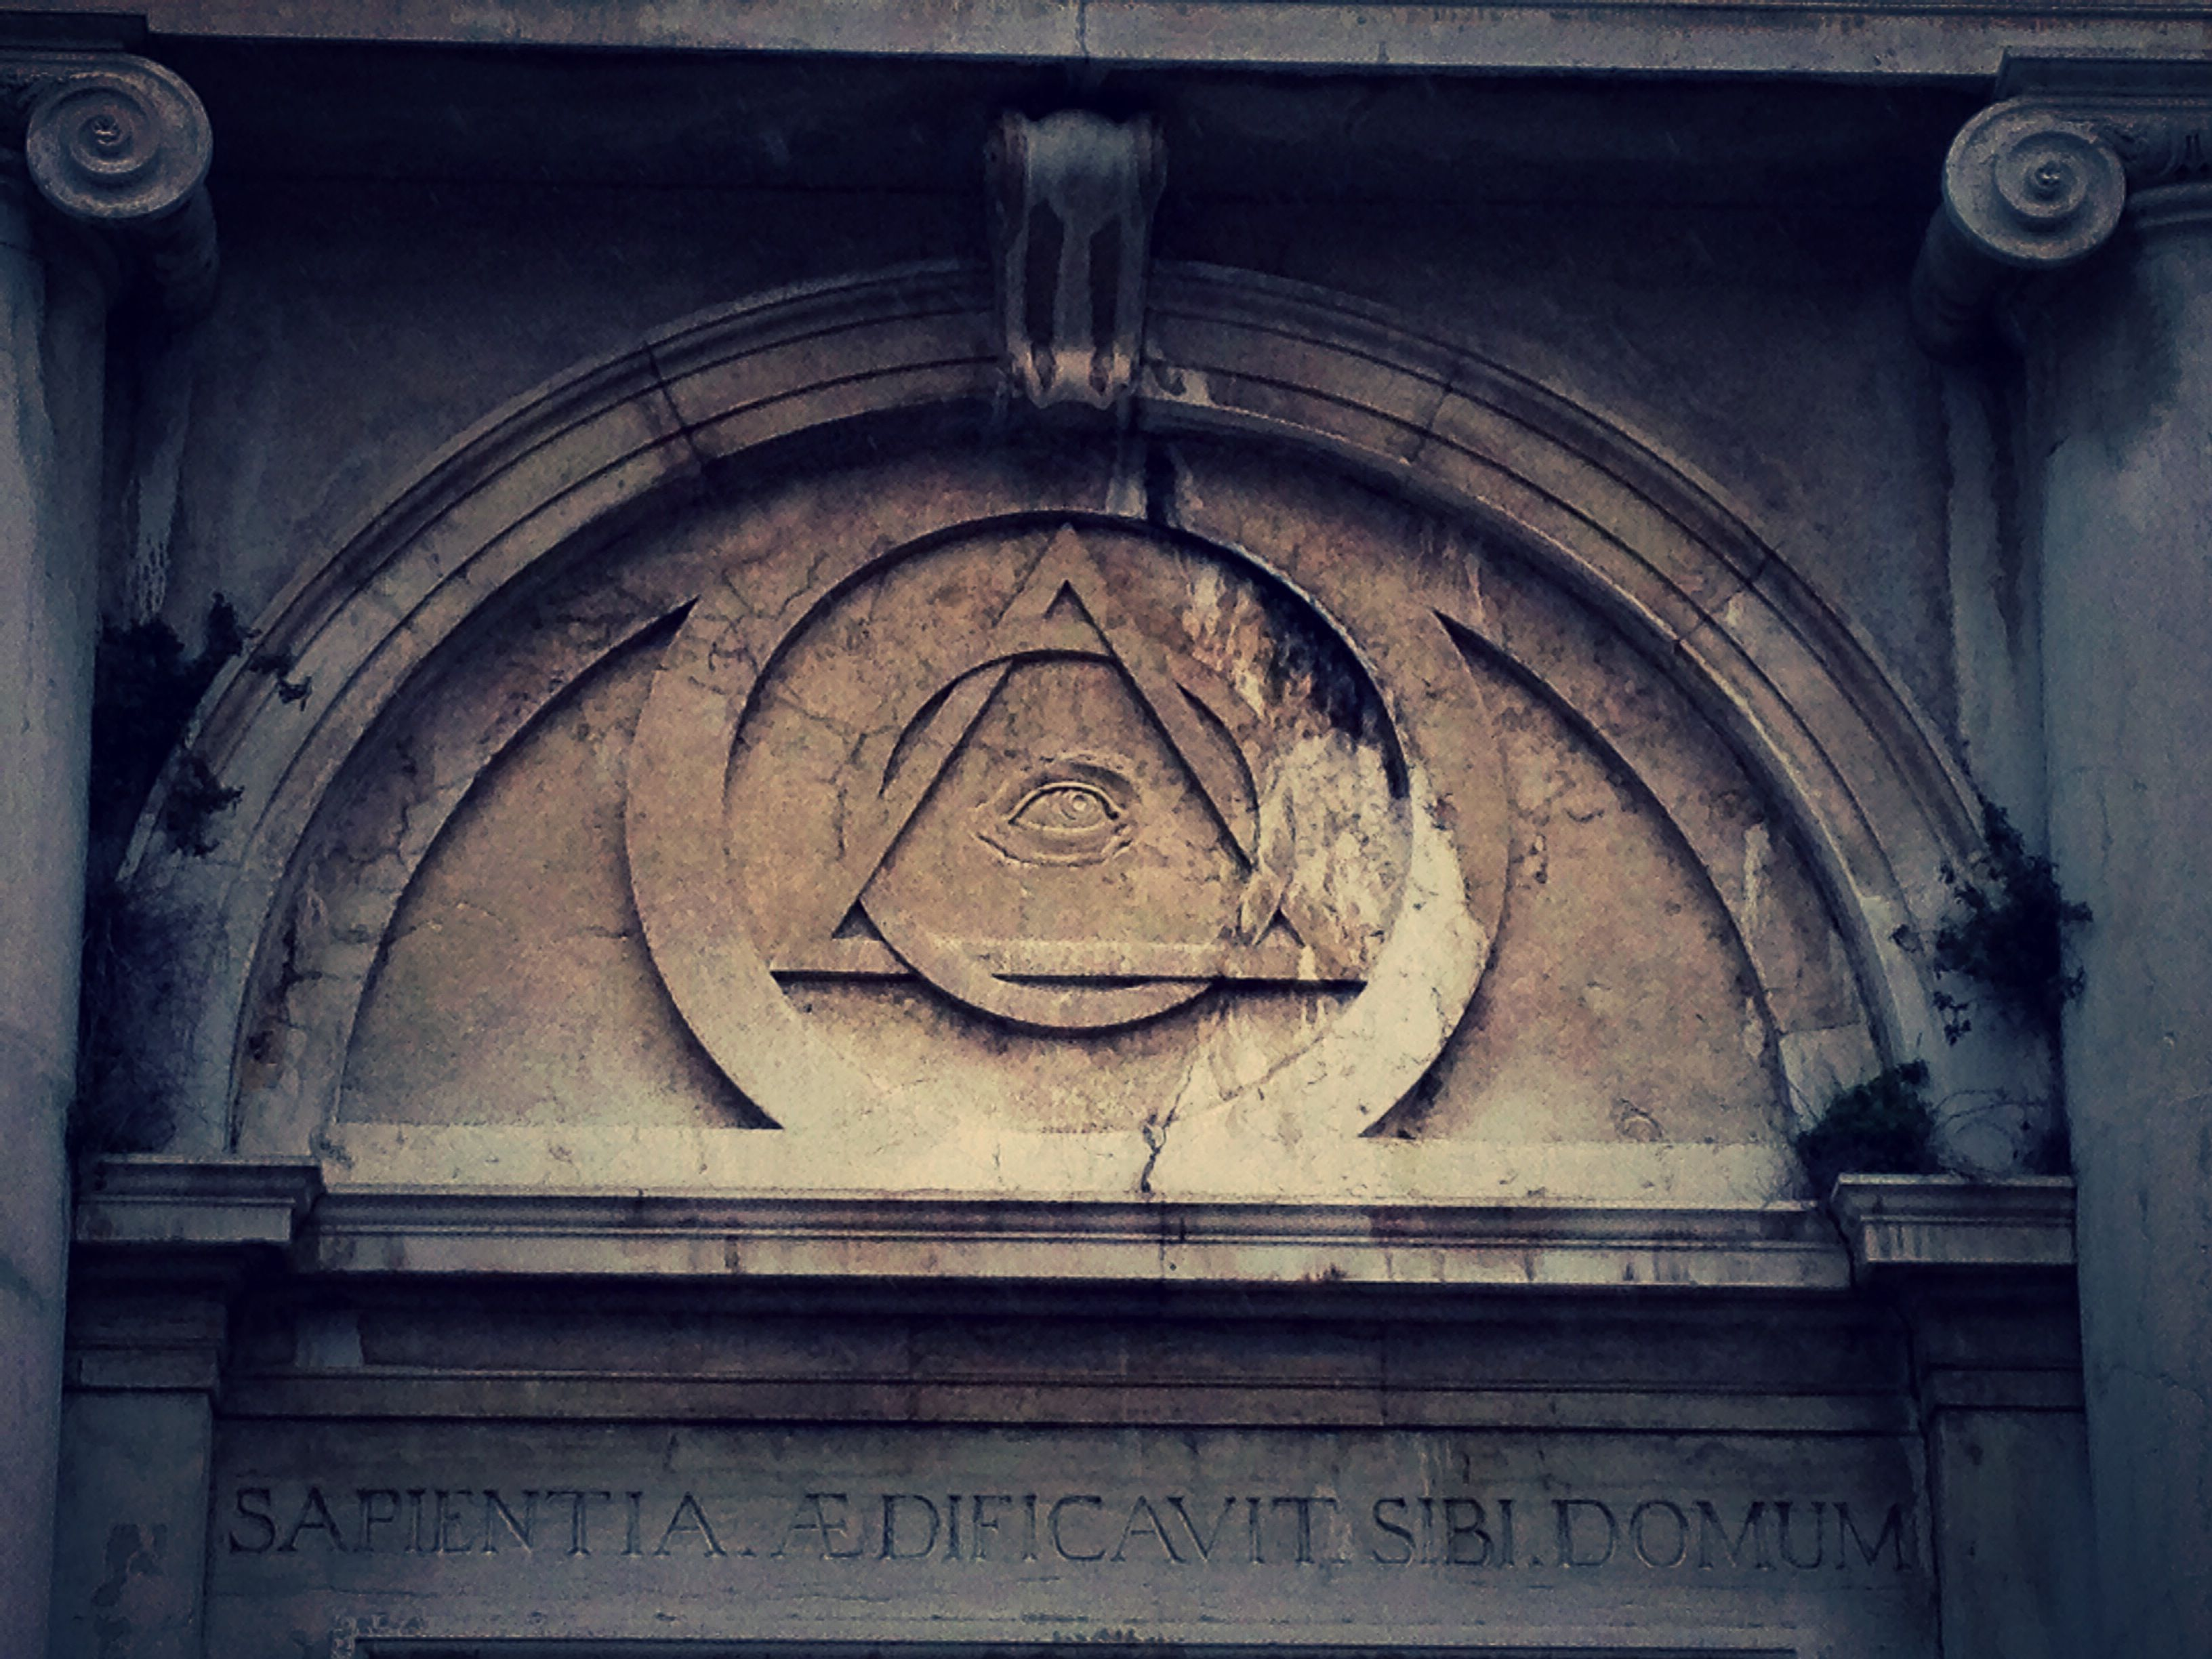 Illuminati symbol on an ancient structure in venice italy illuminati symbol on an ancient structure in venice italy buycottarizona